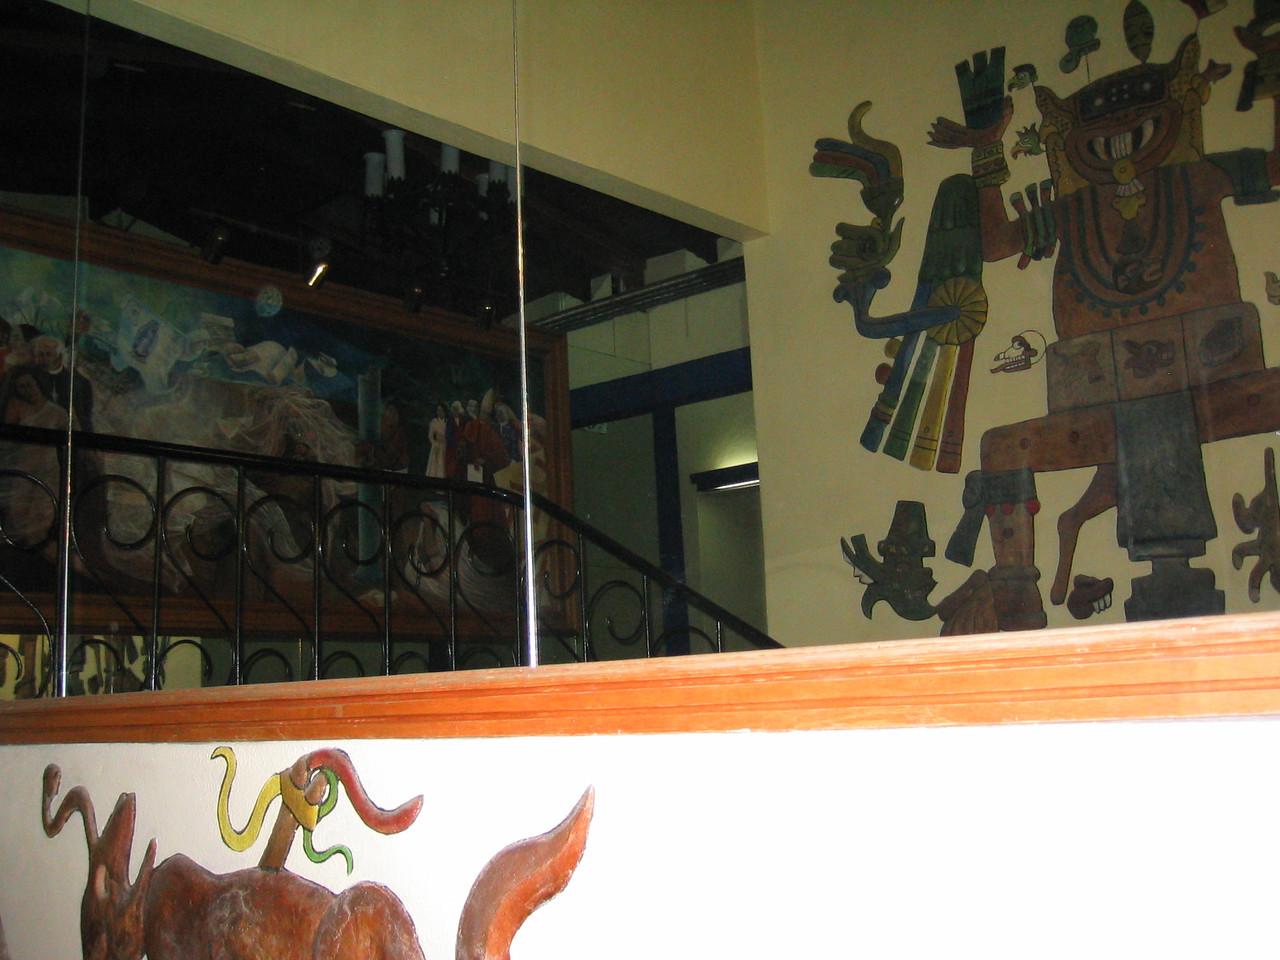 2004 05 28 Friday - Hotel San Nicholas Mayan artwork 1